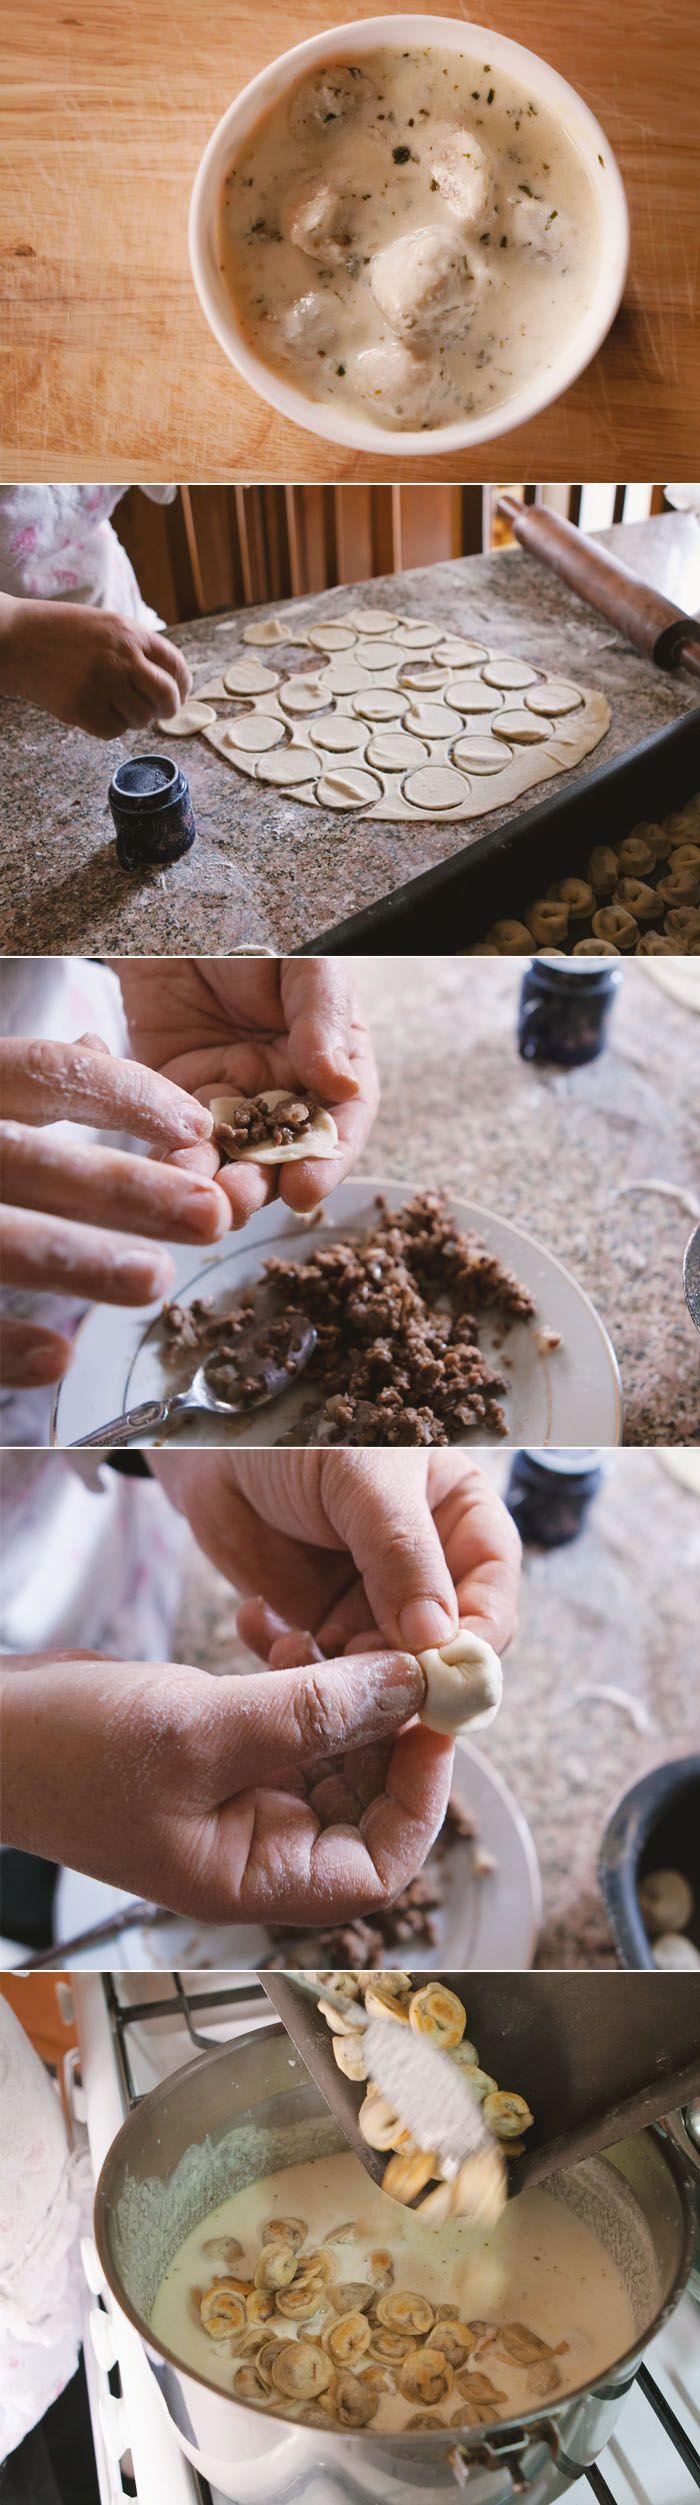 Best 25 syrian recipes ideas on pinterest syrian meat pie shishbarak taqiyet elyahoodi dinen meat dumplings in yogurt sauce middleeasternfood syrian recipeslebanese forumfinder Choice Image